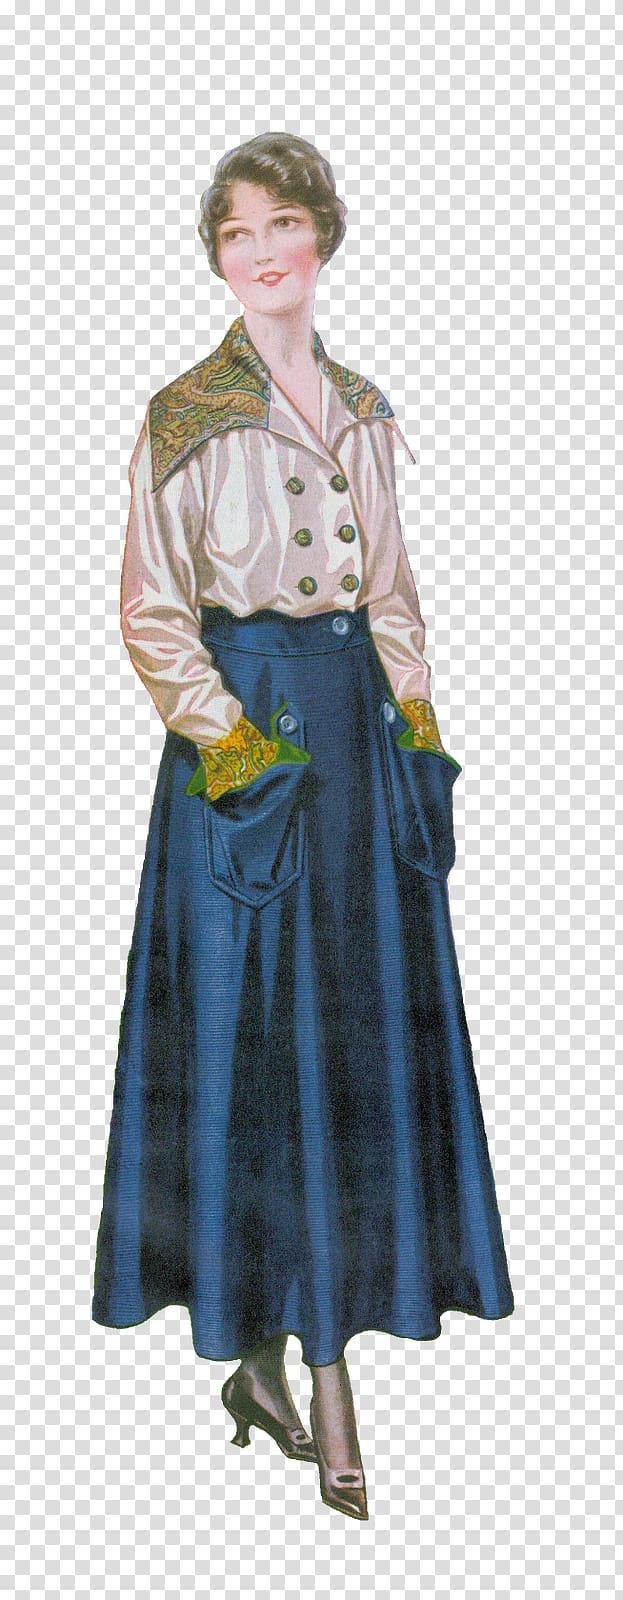 Edwardian era 1900s Victorian era 1910s Belle Époque, dress.